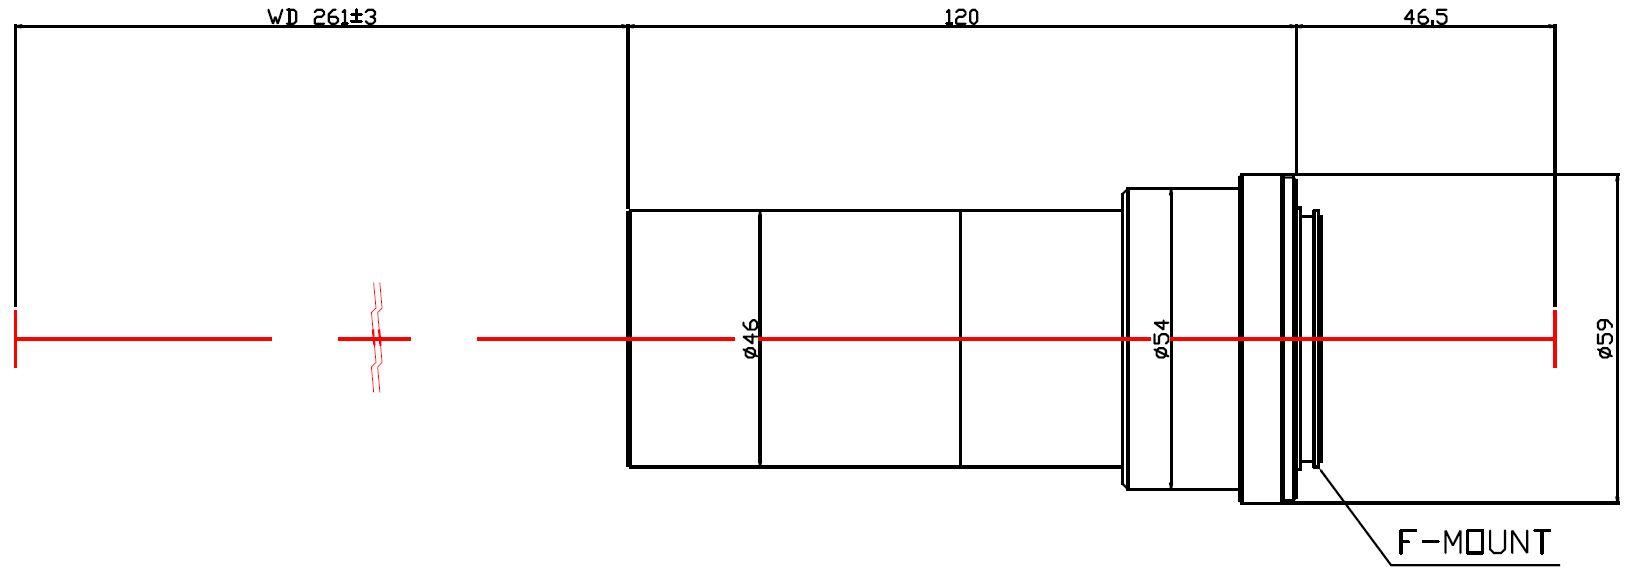 Lensagon MF8M-043-261